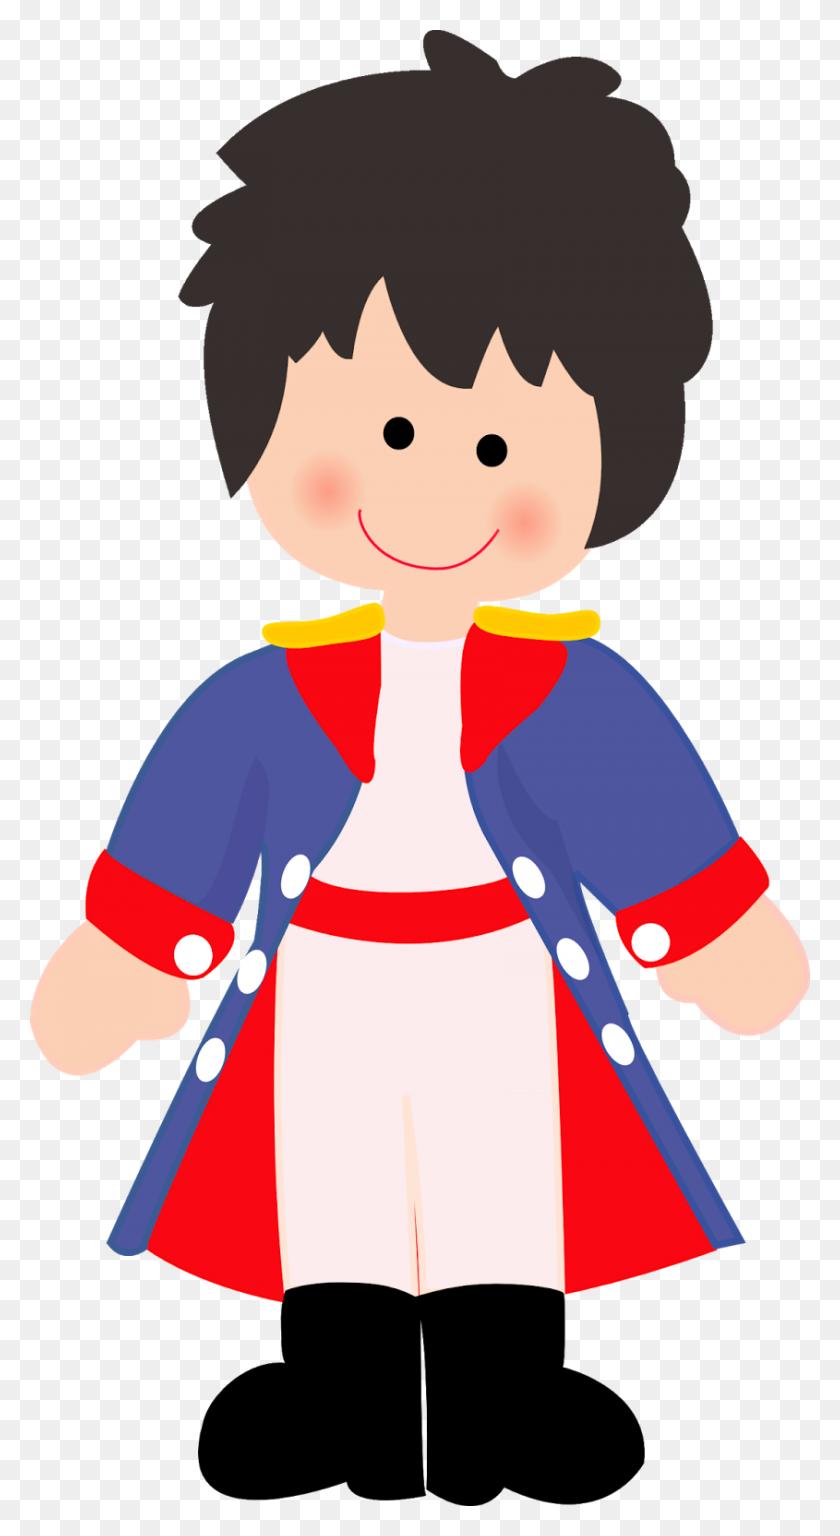 Pequeno Principe Niver The Little Prince, Prince - Baby Prince Clipart